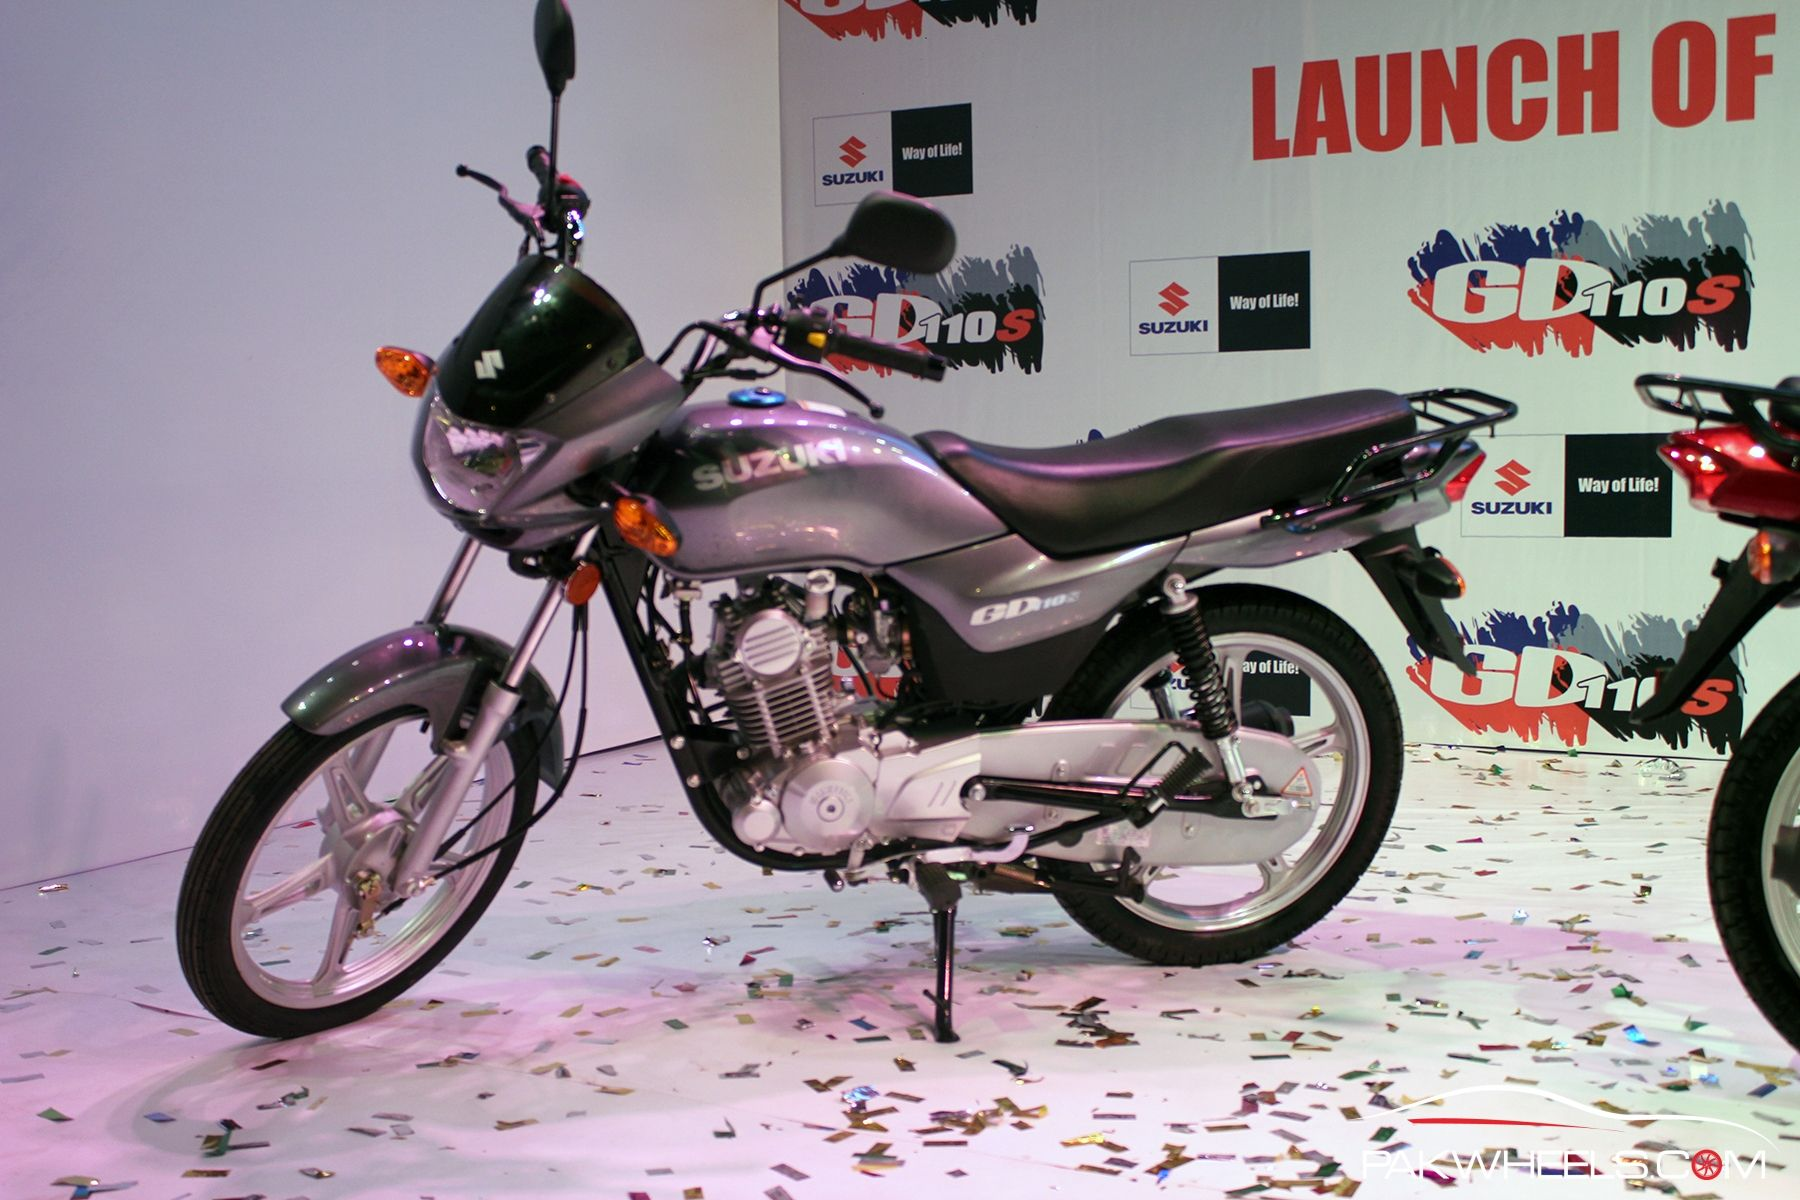 Pak Suzuki launches the upgraded Suzuki GD110S PakWheels